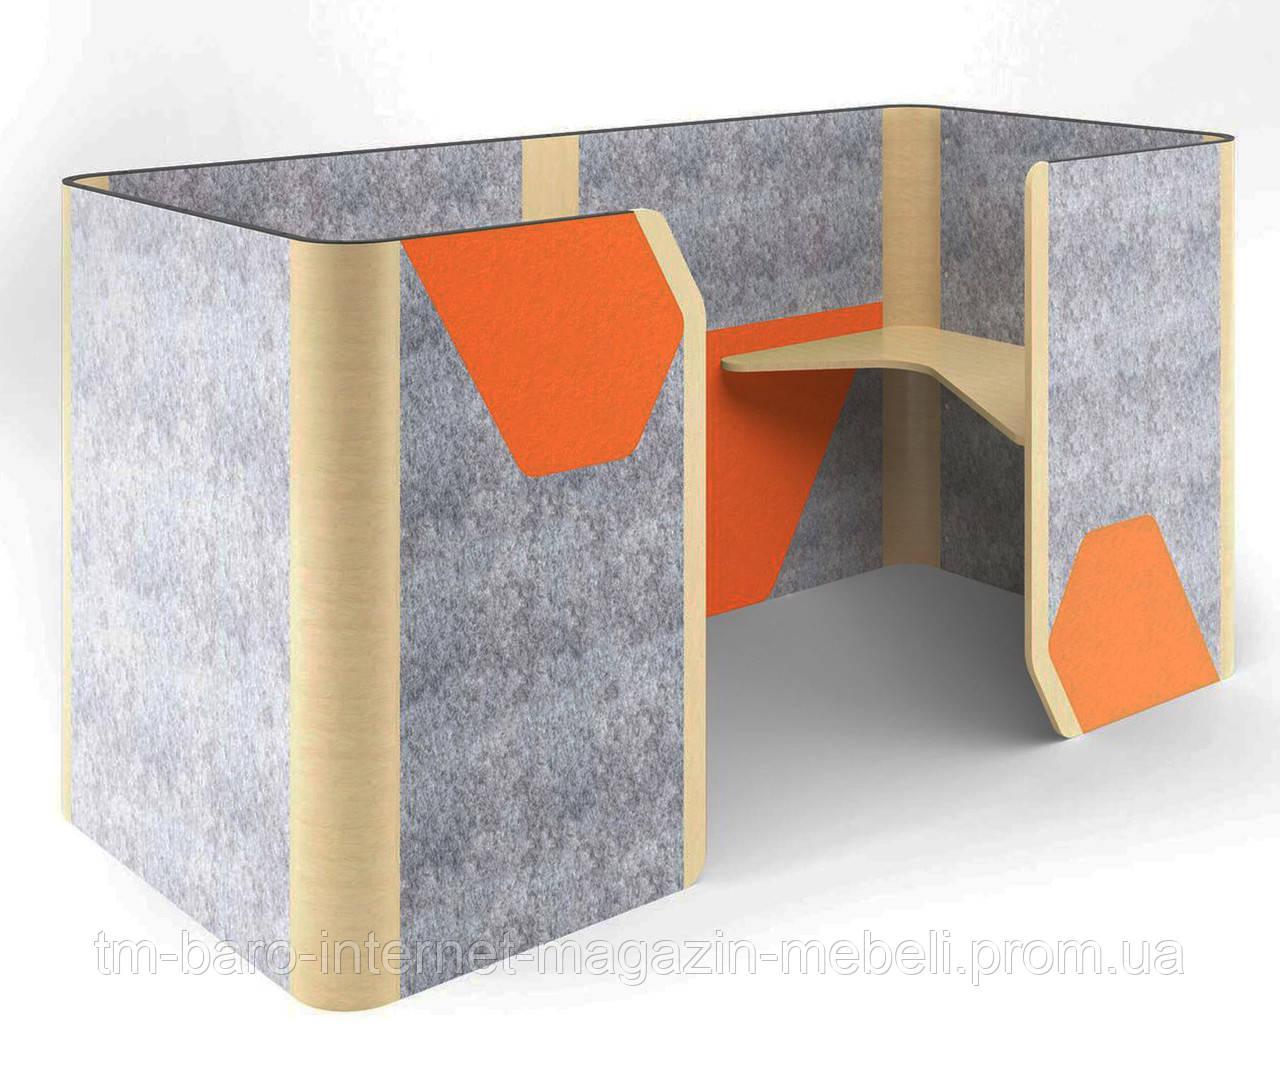 Кабина двойная Cabi фетр серый /фетр оранжевый, белый беж